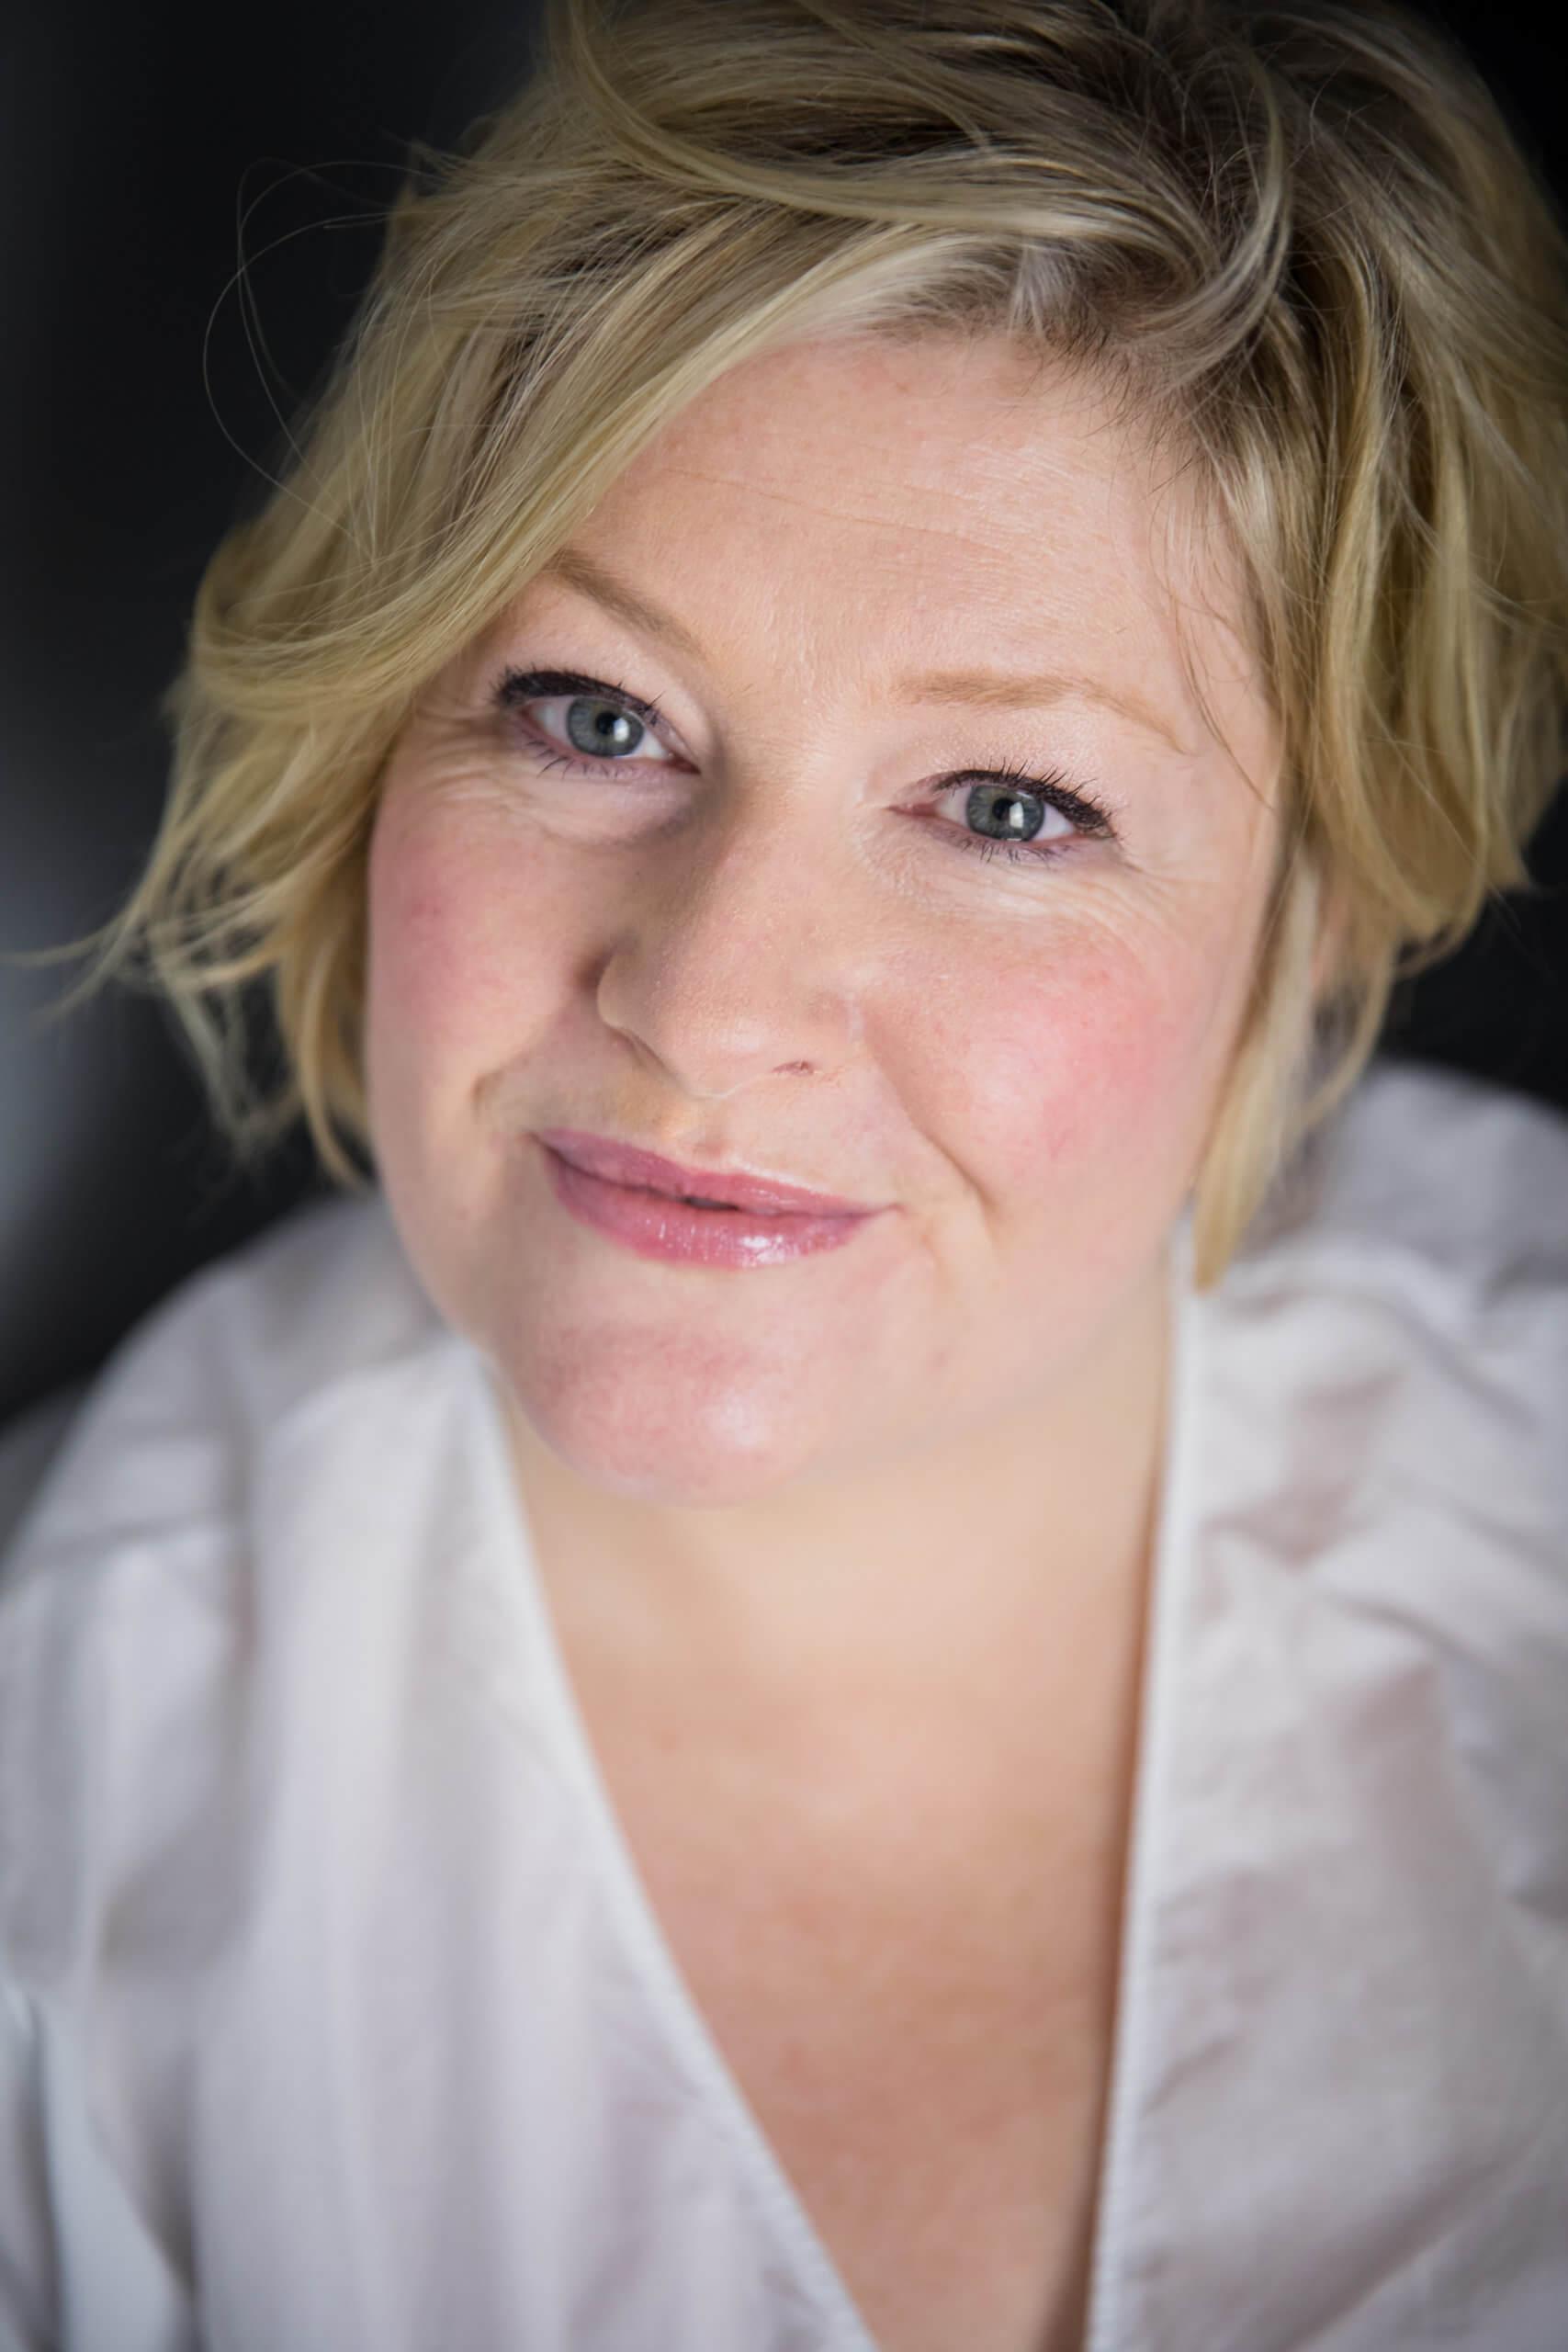 Internationally acclaimed mezzo-soprano Karen Cargill